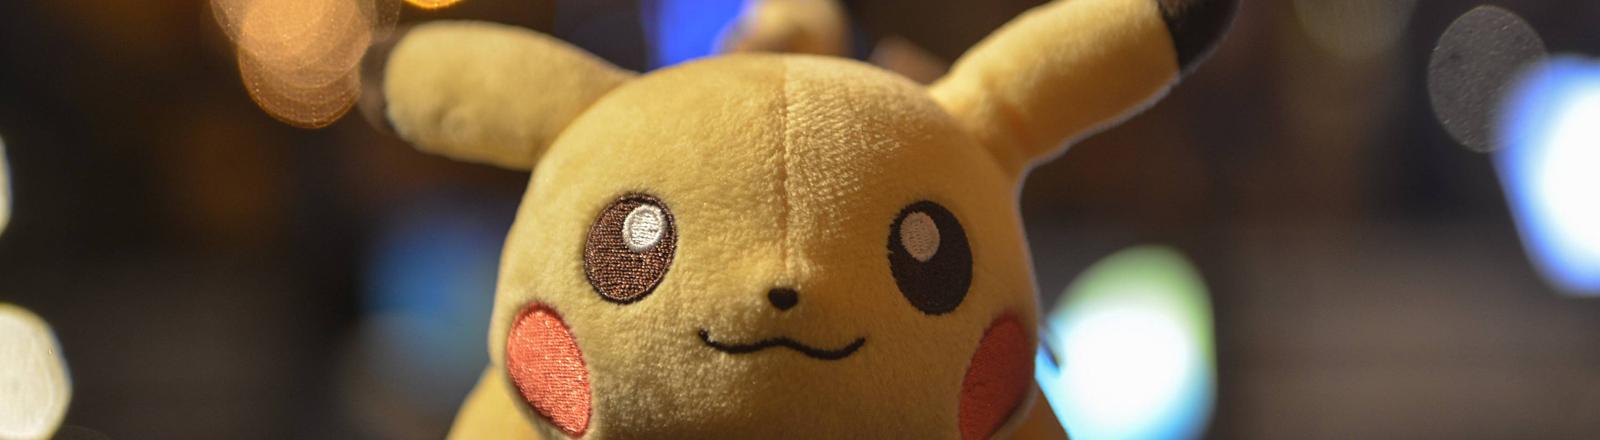 Pokémon-Figuren in Malaysia